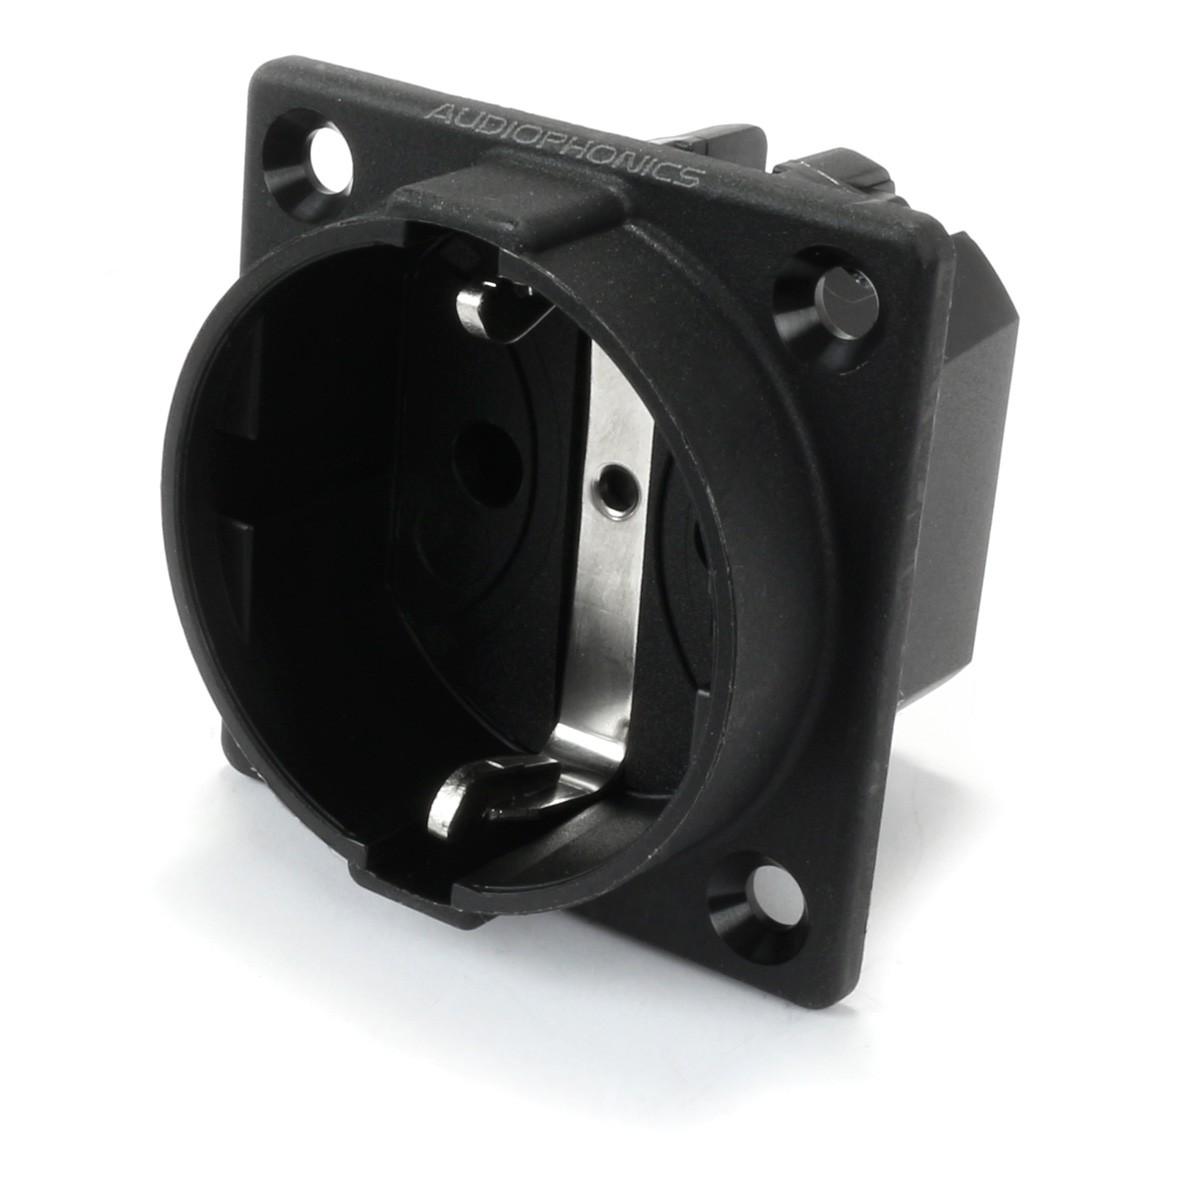 ABL SURSUM Schuko inlet 250V 16A IP20 Black